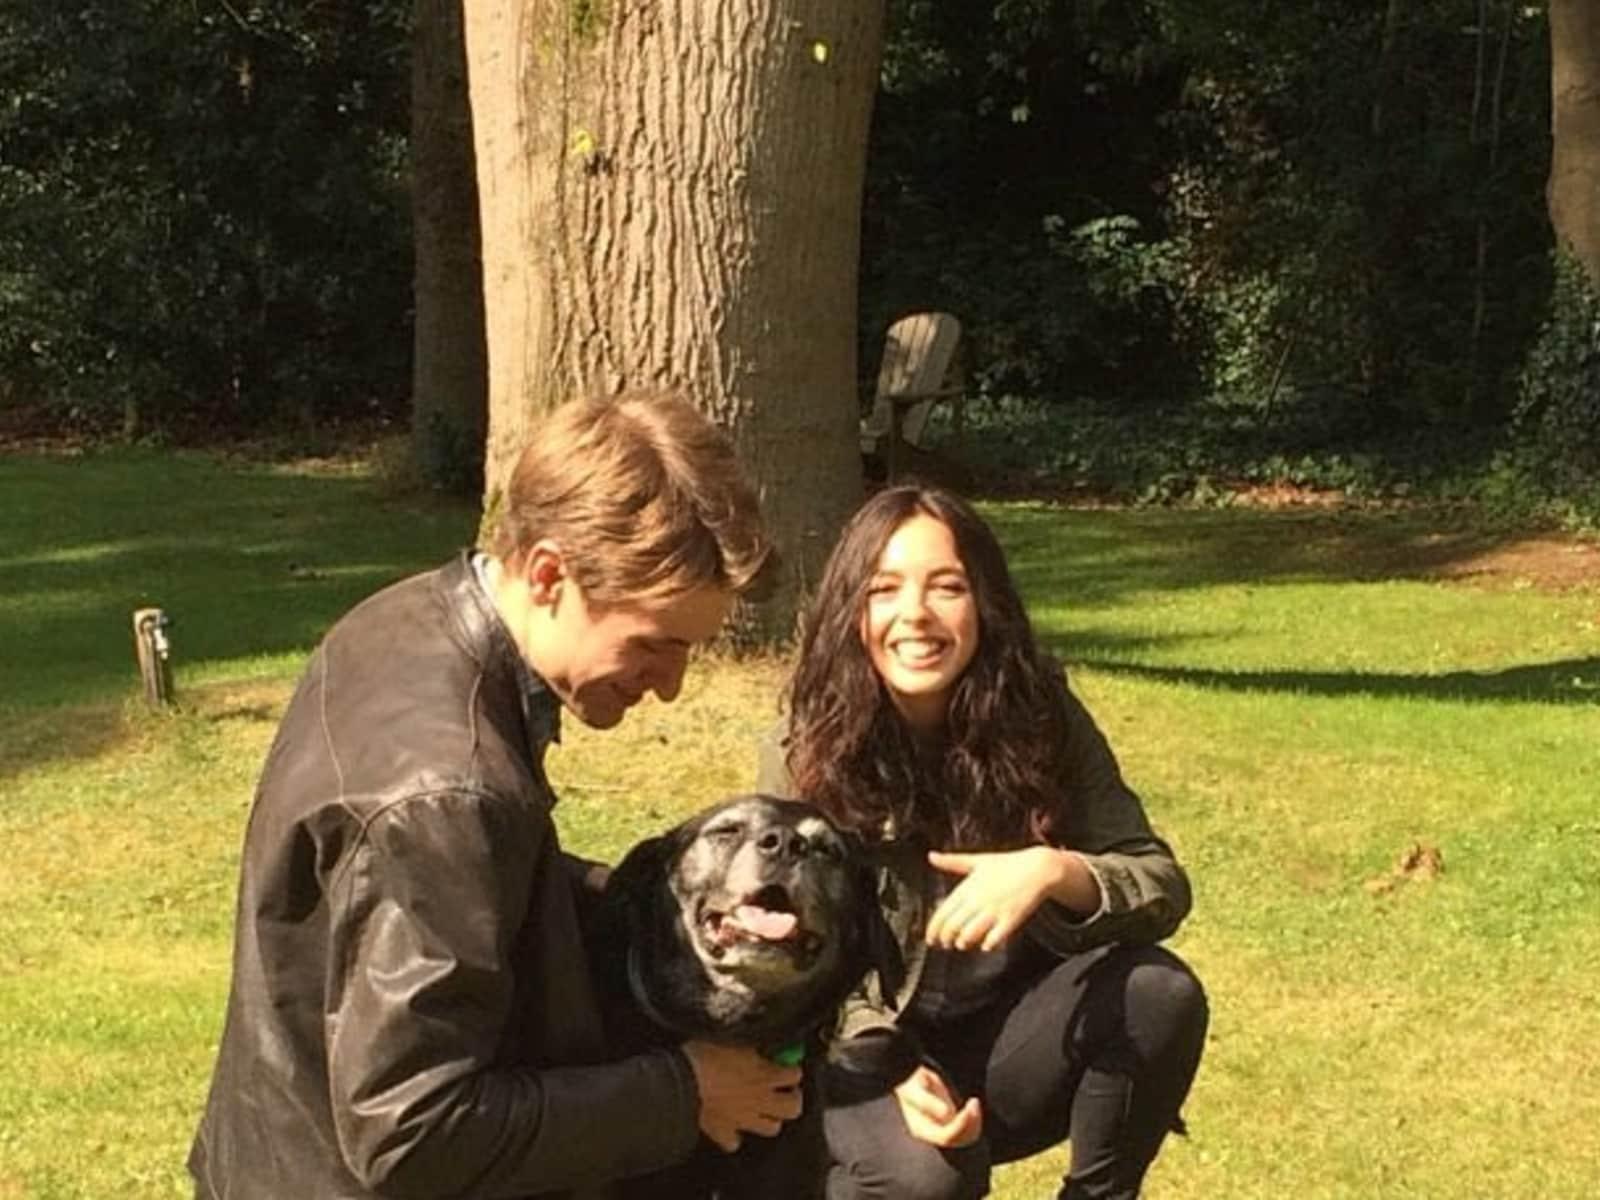 Samantha & Peter from Rotterdam, Netherlands